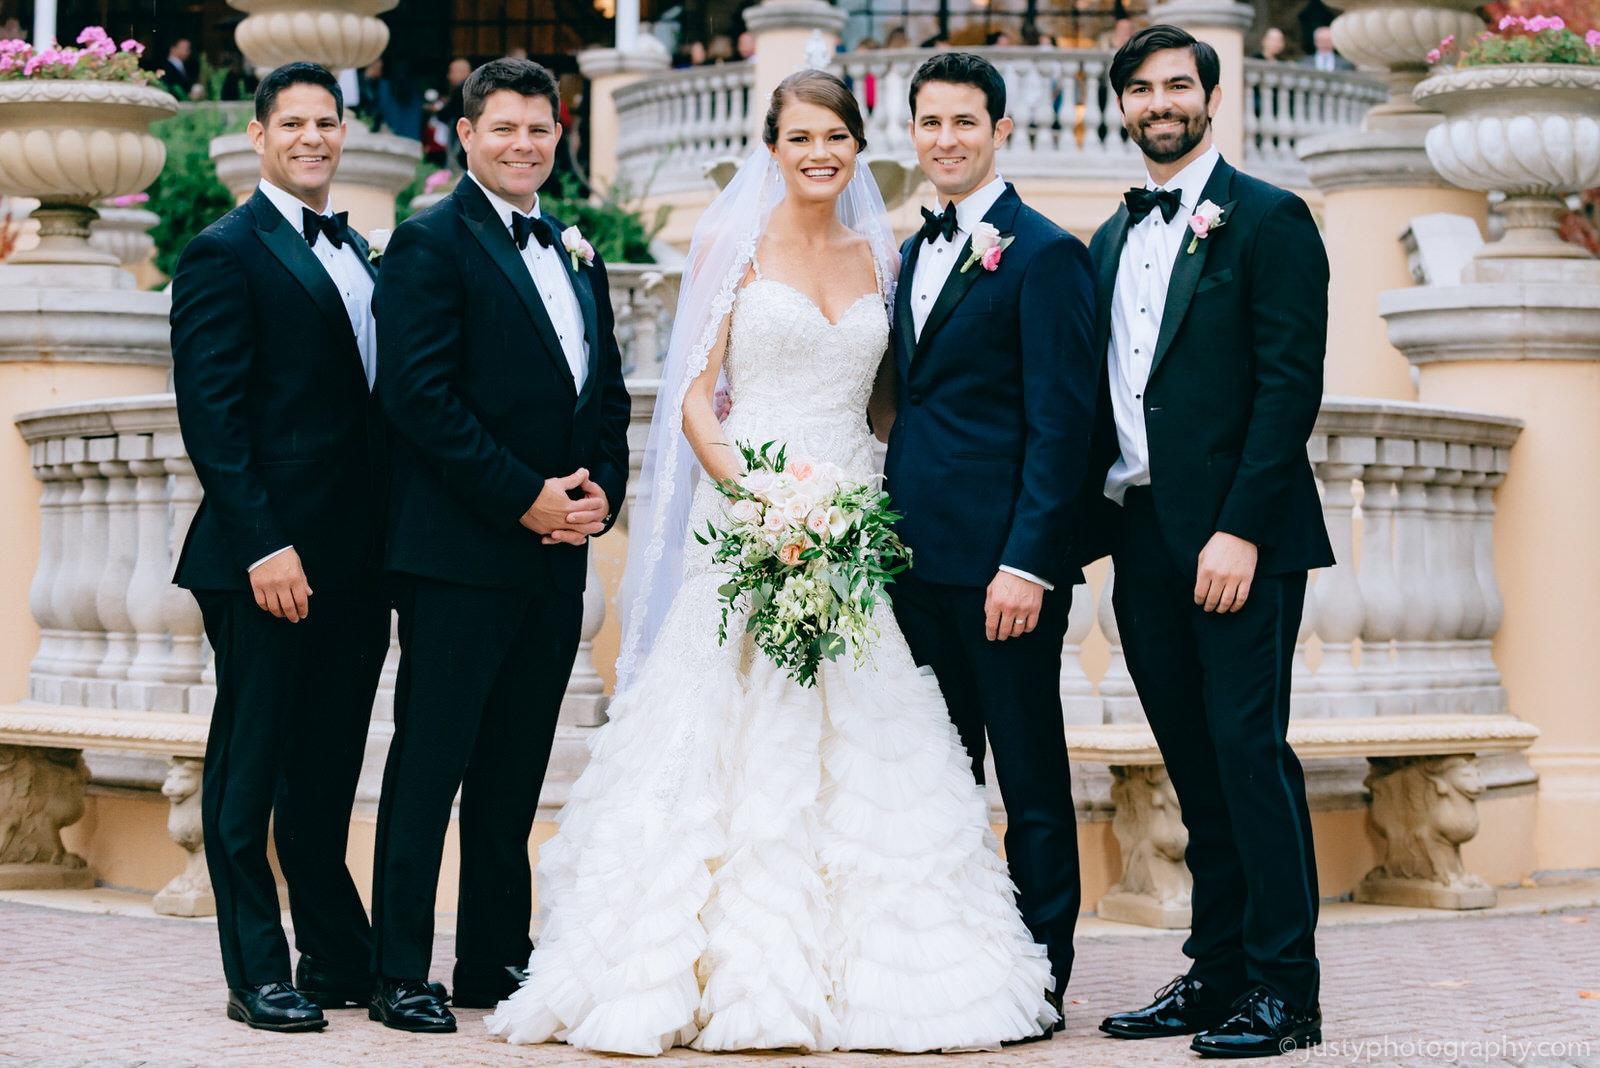 Omni Shoreham wedding photos-washington-dc-wedding-venues (127 of 171).jpg